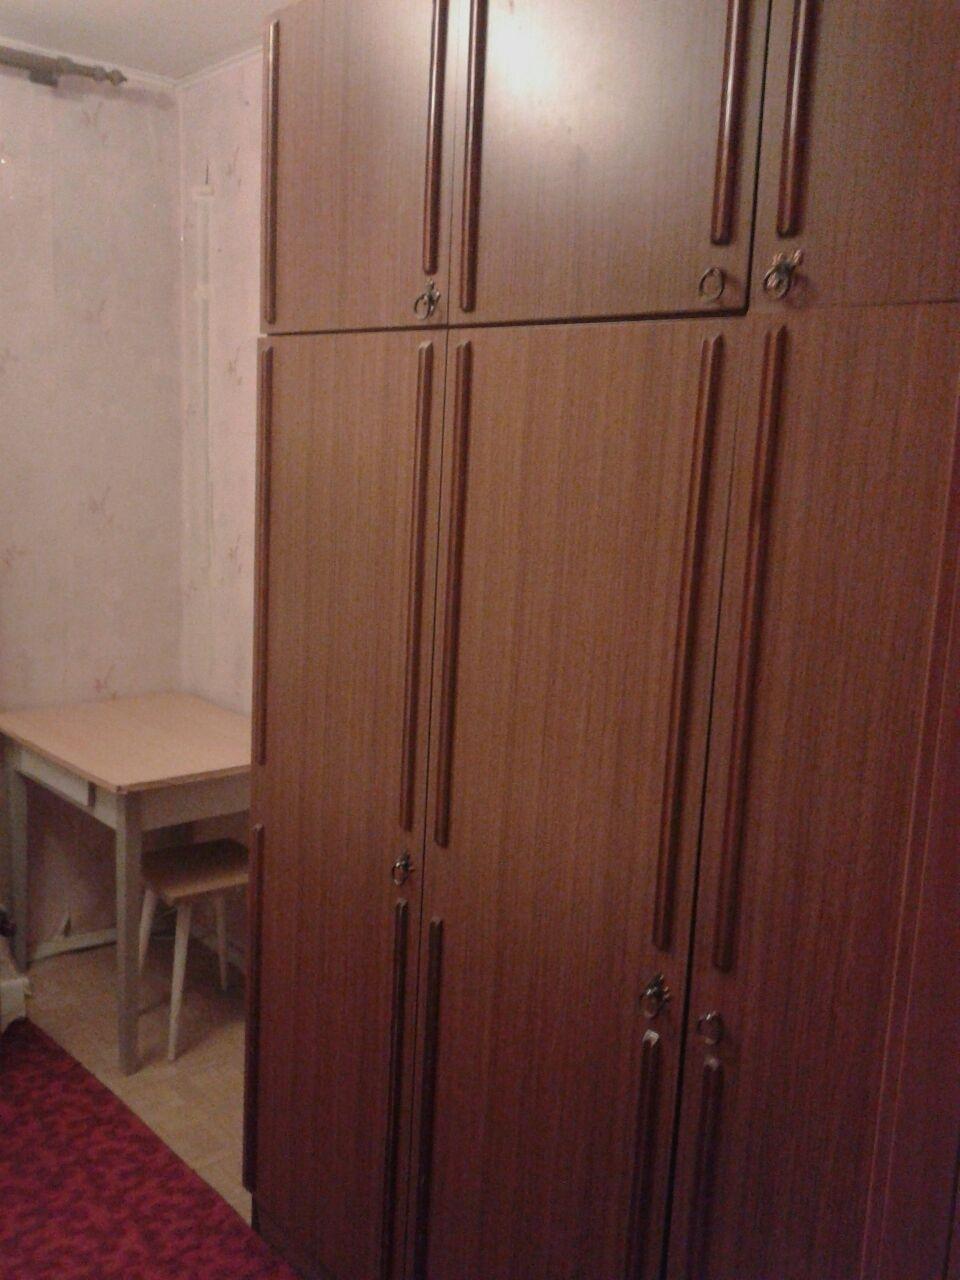 http://alt.pro.bkn.ru/images/r_big/0d2f8dca-f799-11e7-b300-448a5bd44c07.jpg